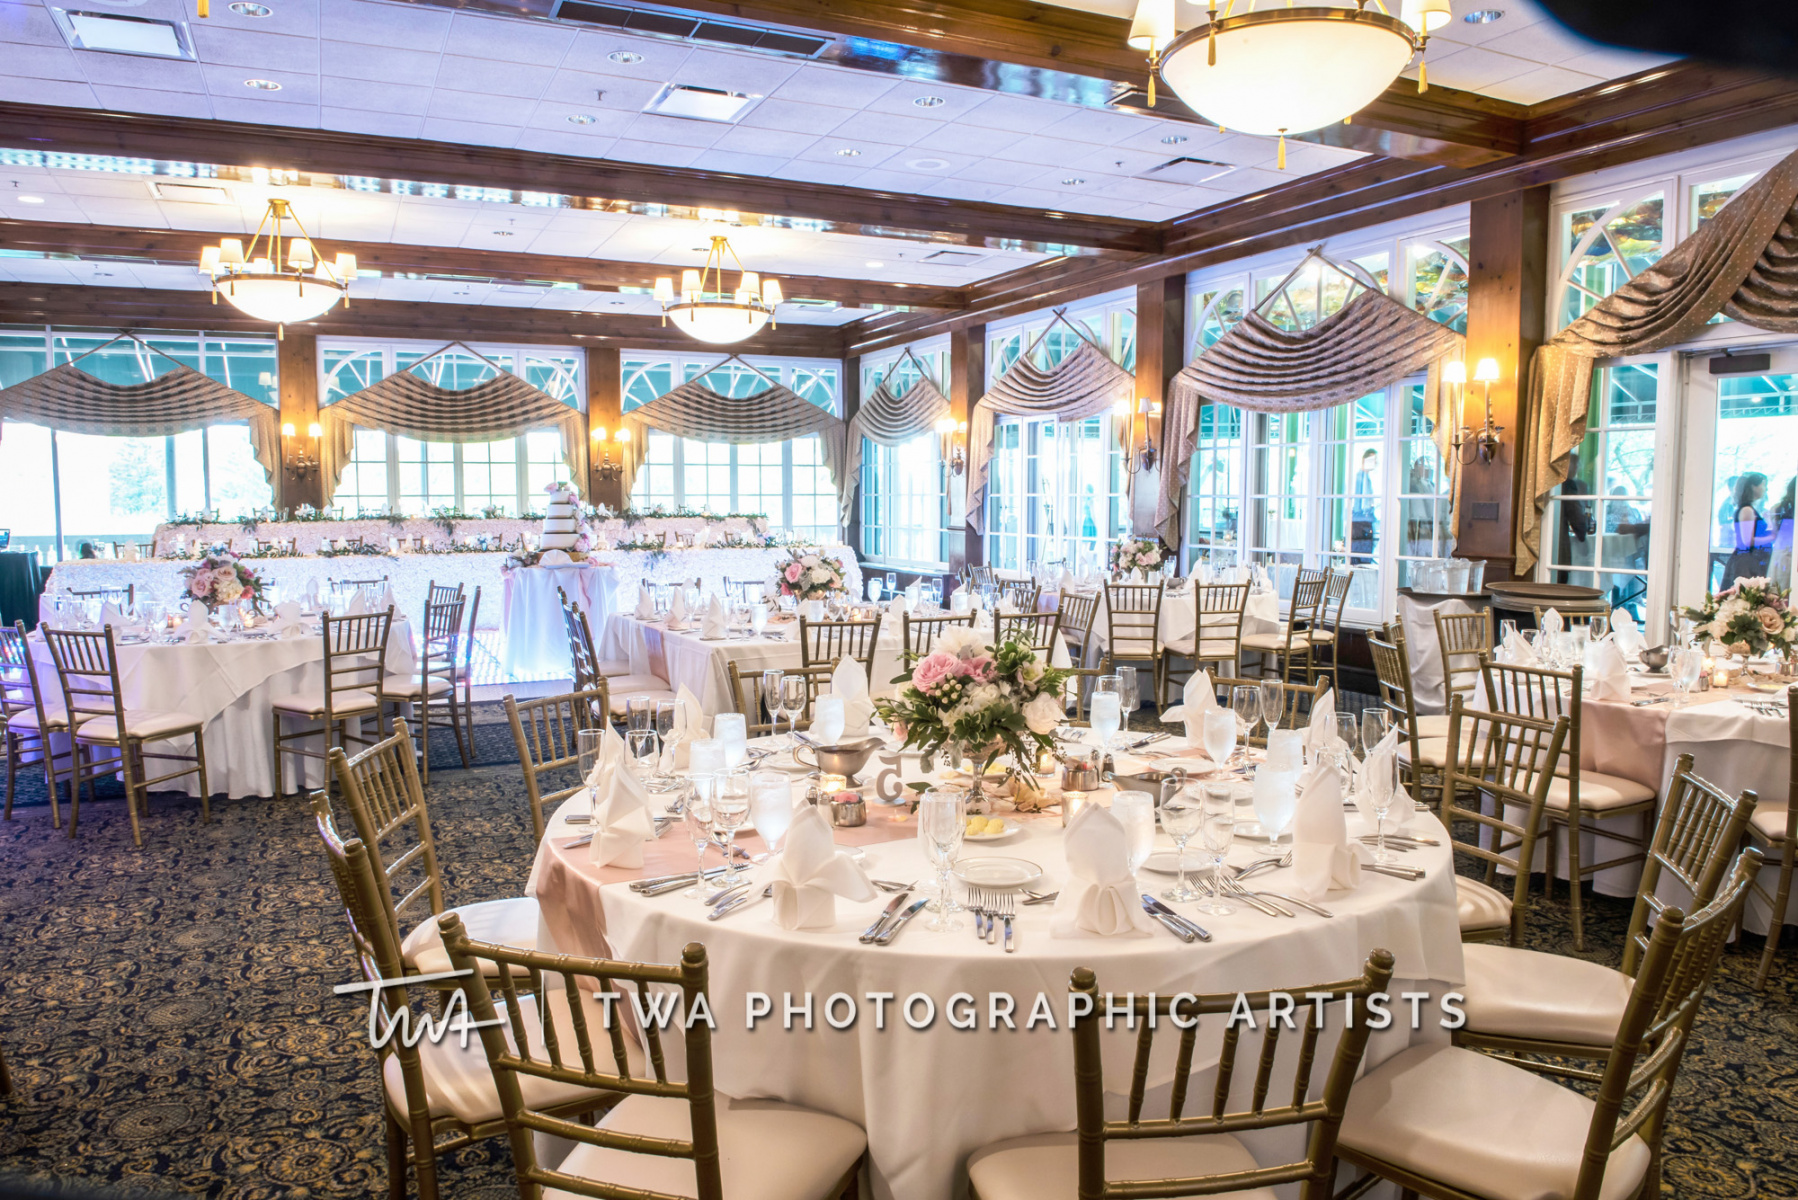 Chicago-Wedding-Photographer-TWA-Photographic-Artists-Drake-Oak-Brook_Kane_Putman_MC_JH-1527